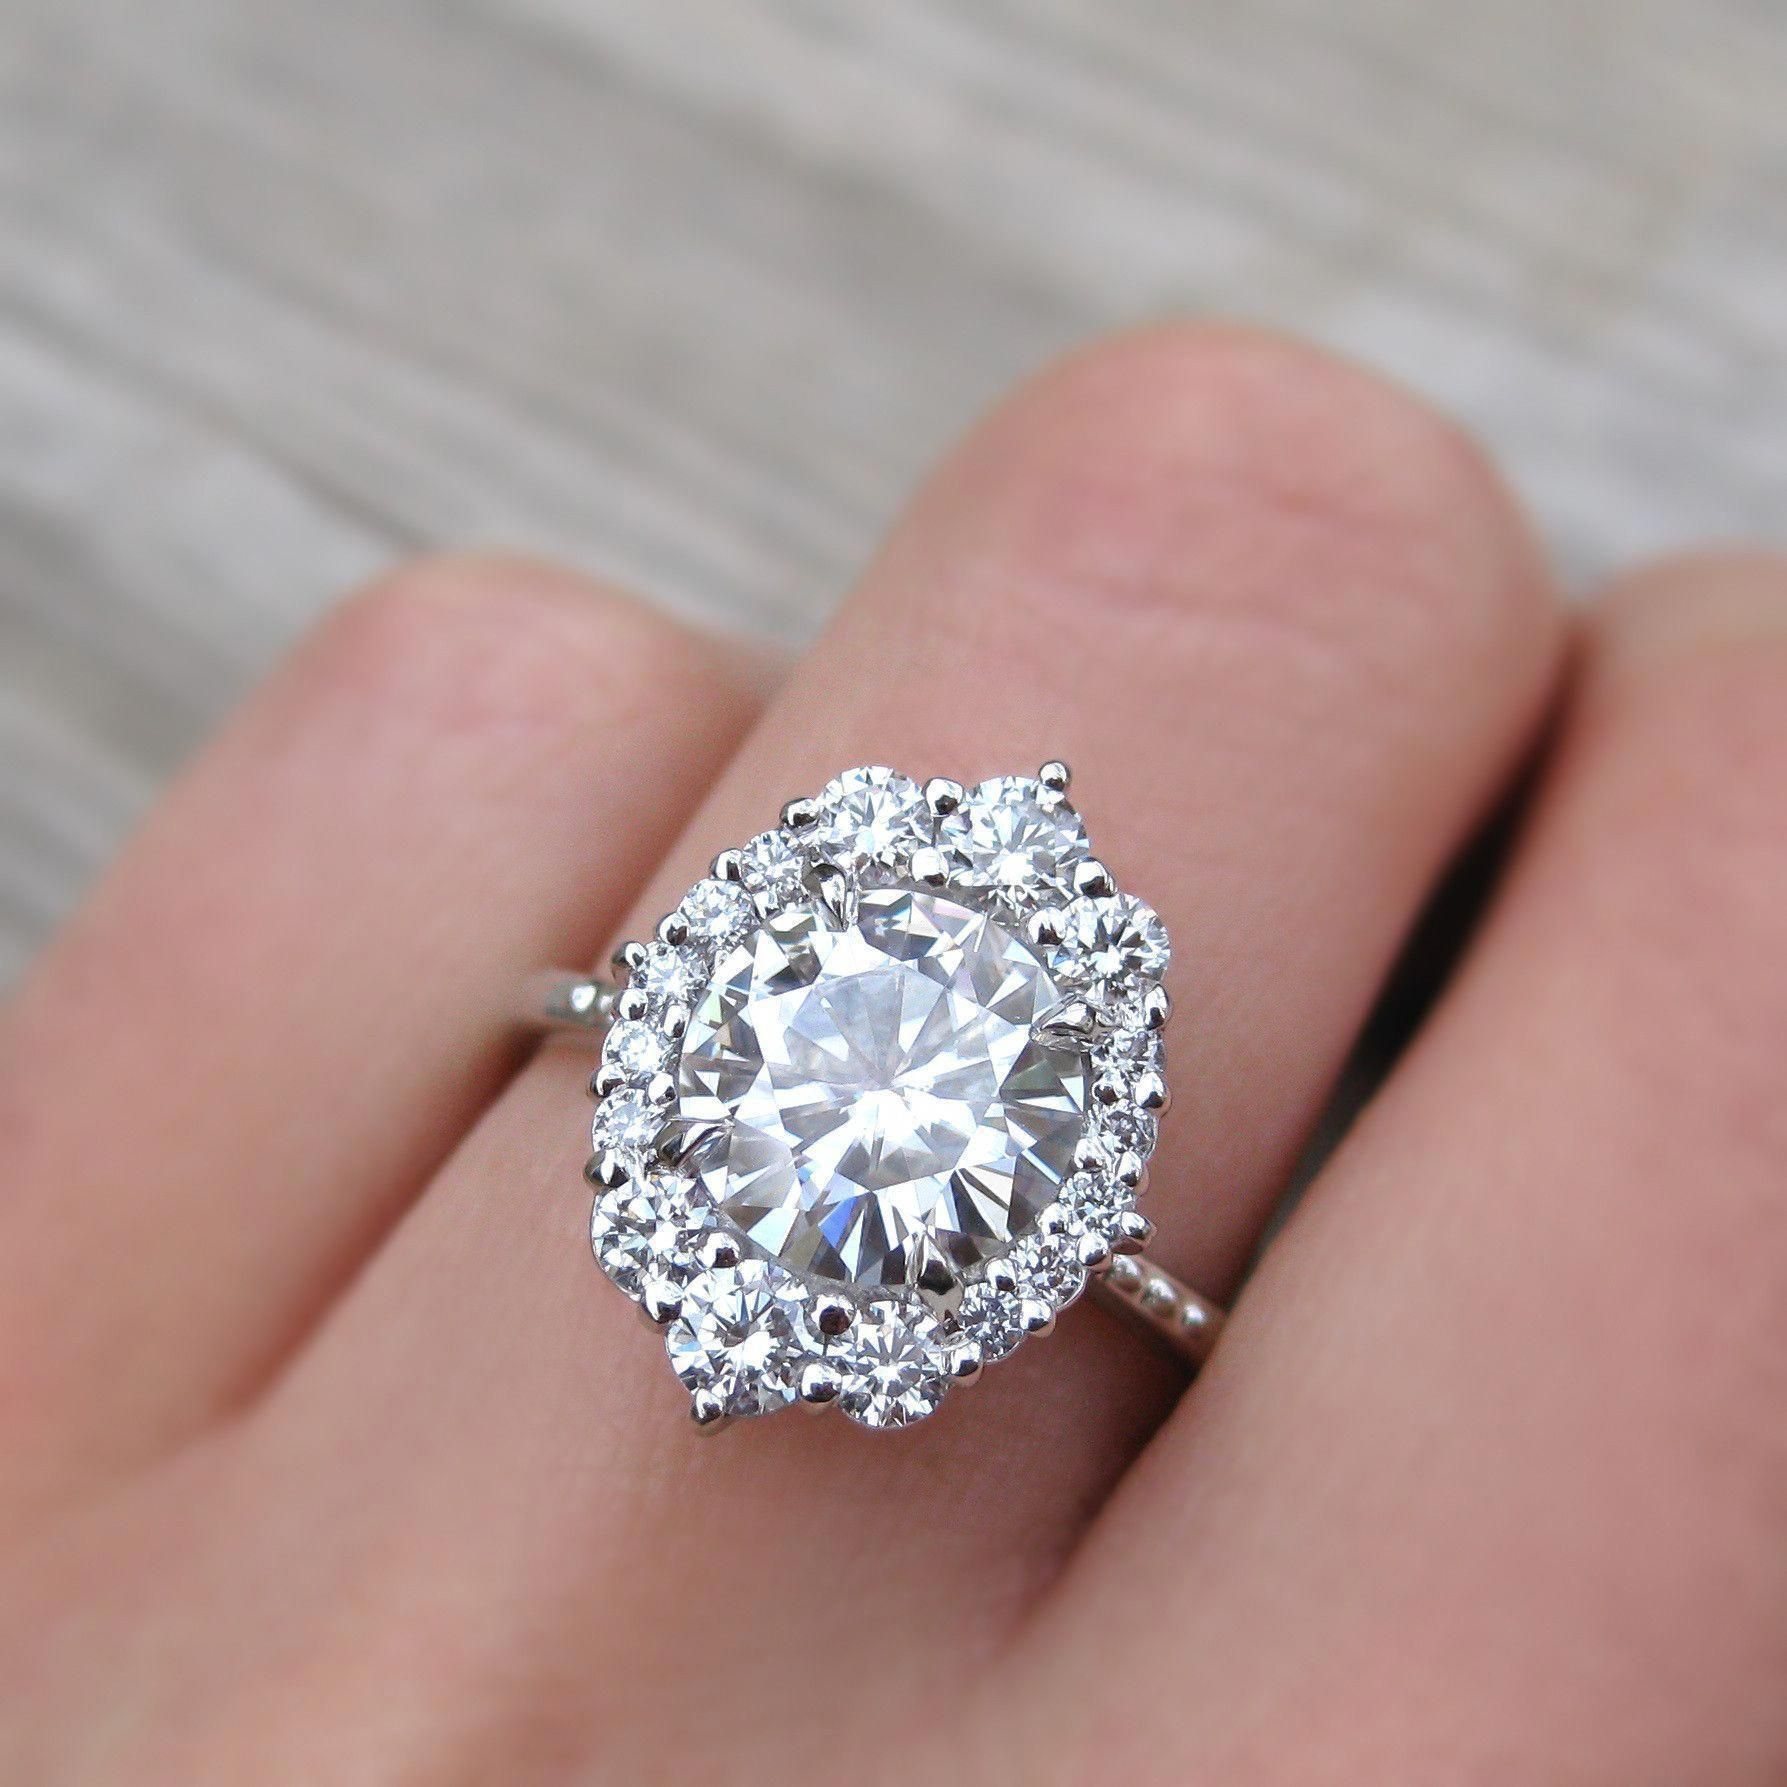 Forever One™ or Supernova™ Moissanite Engagement Ring with